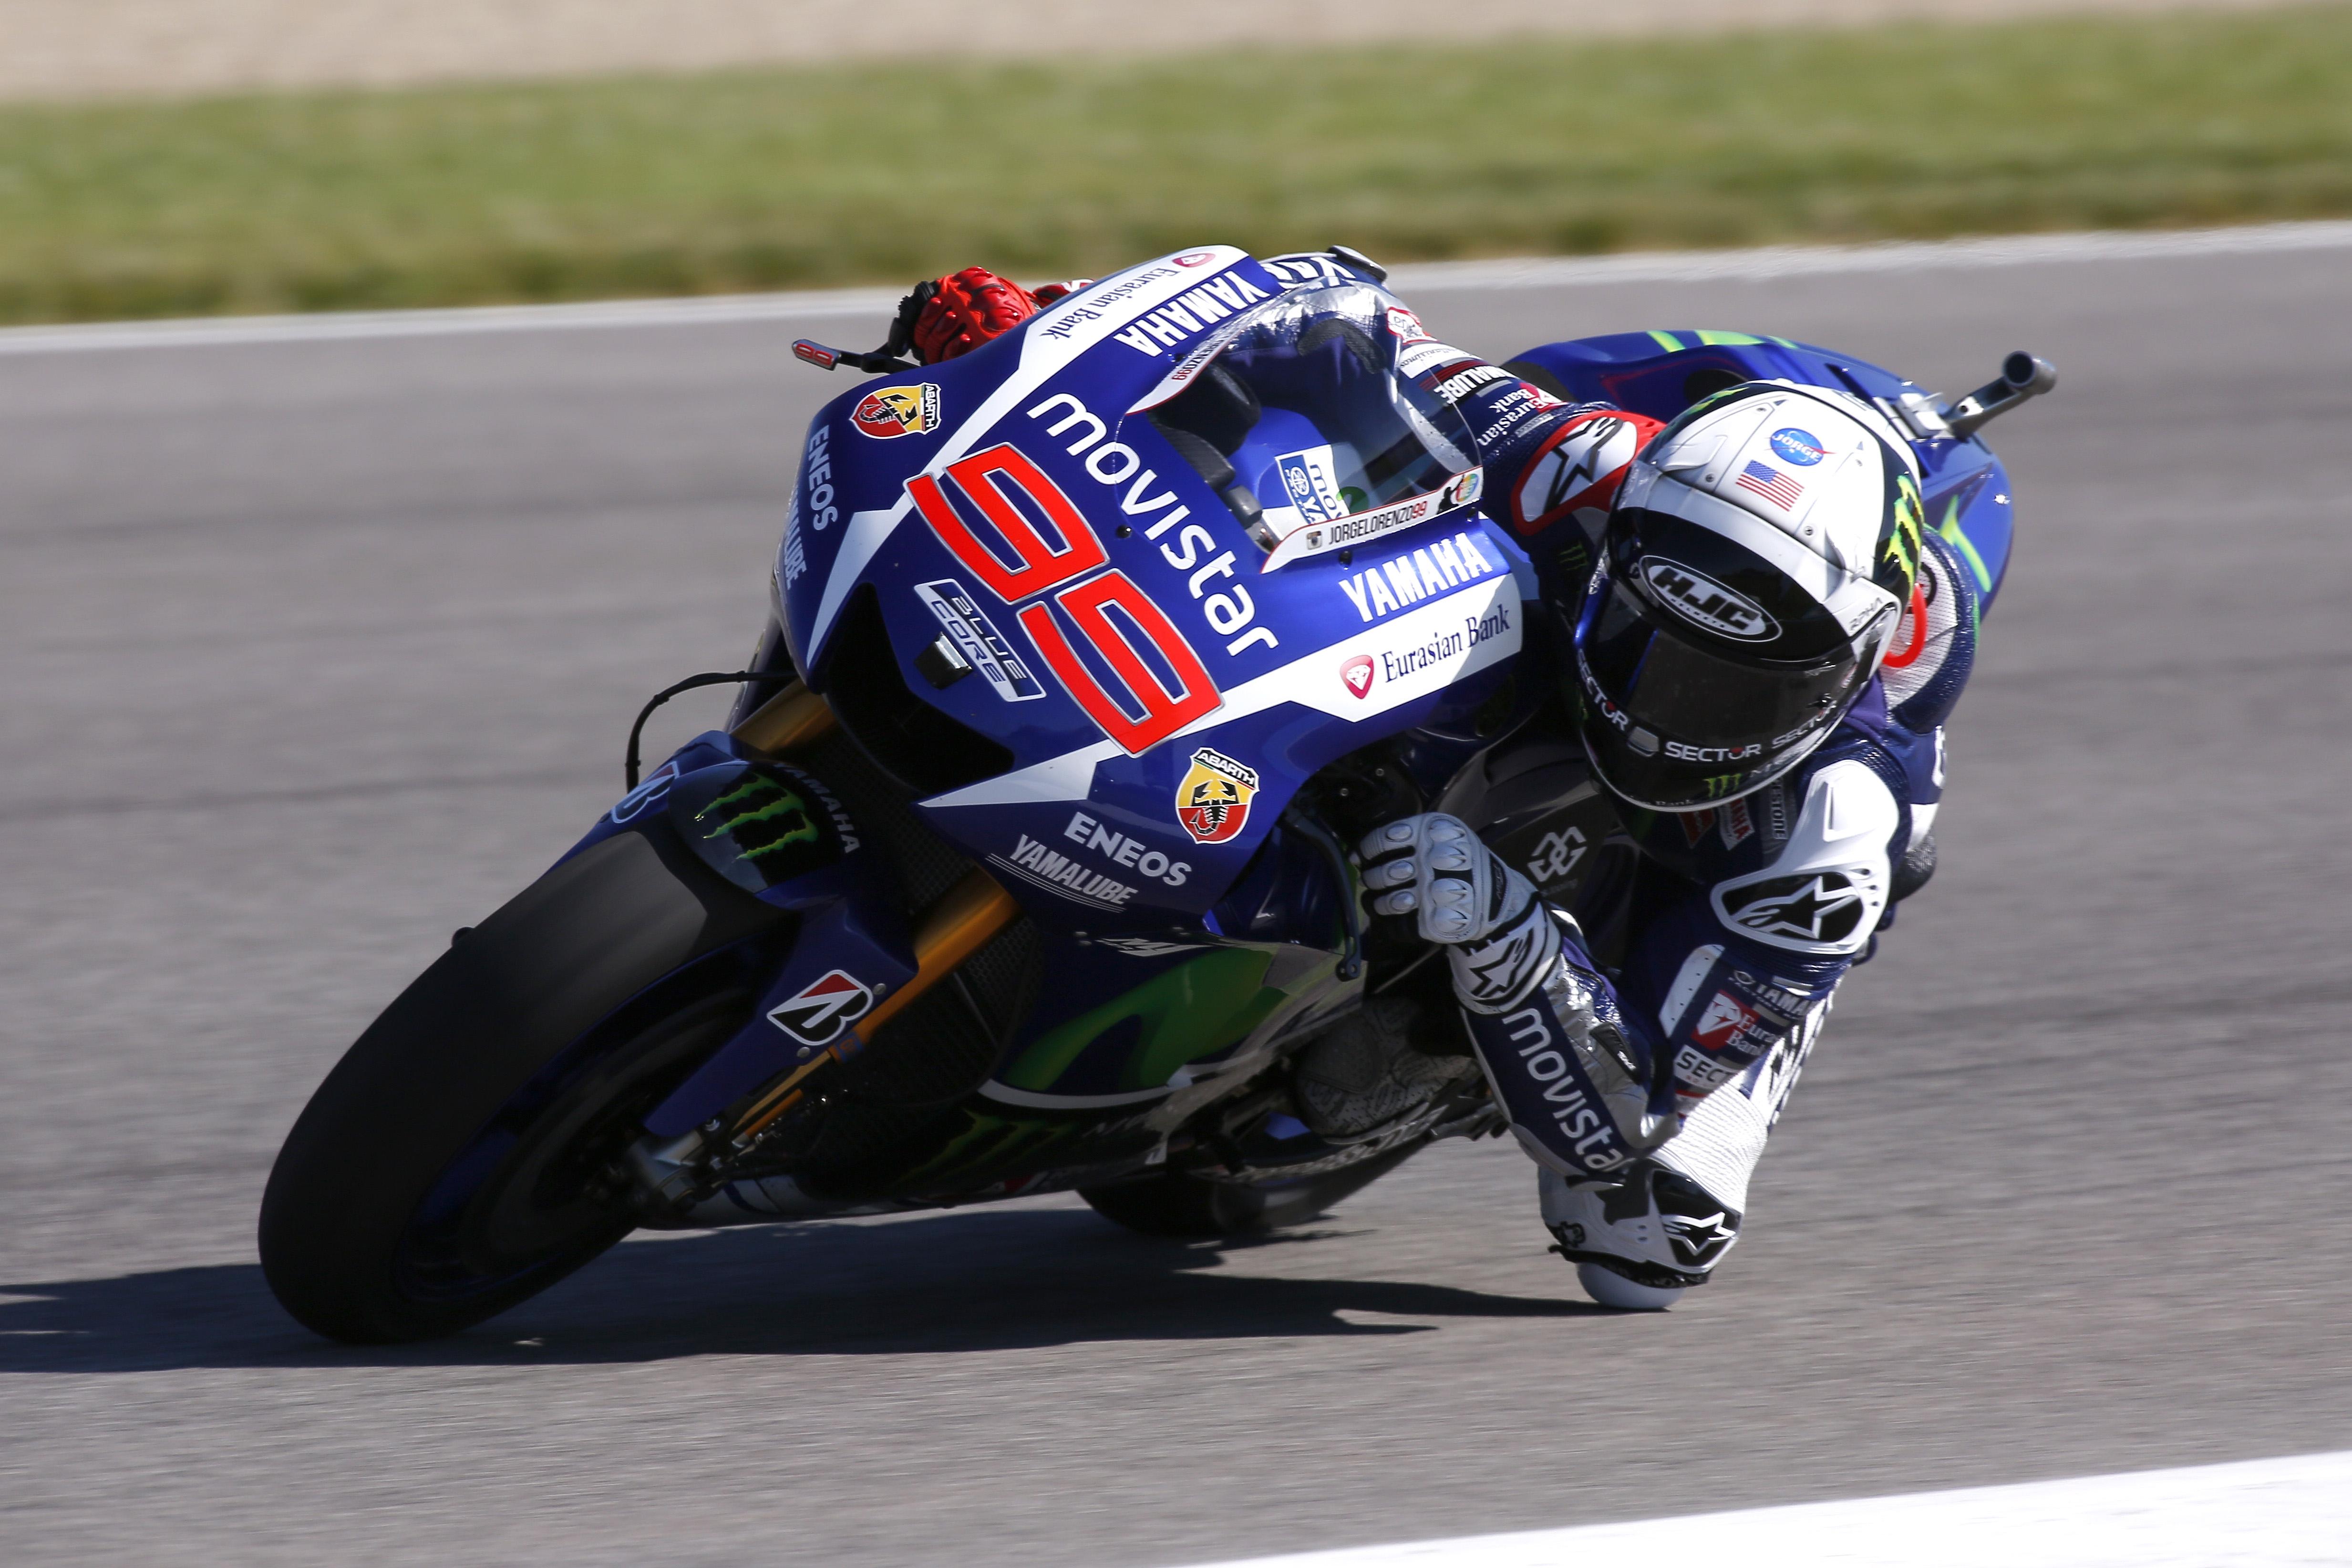 MotoGP: Lorenzo domina il venerdì a Indy